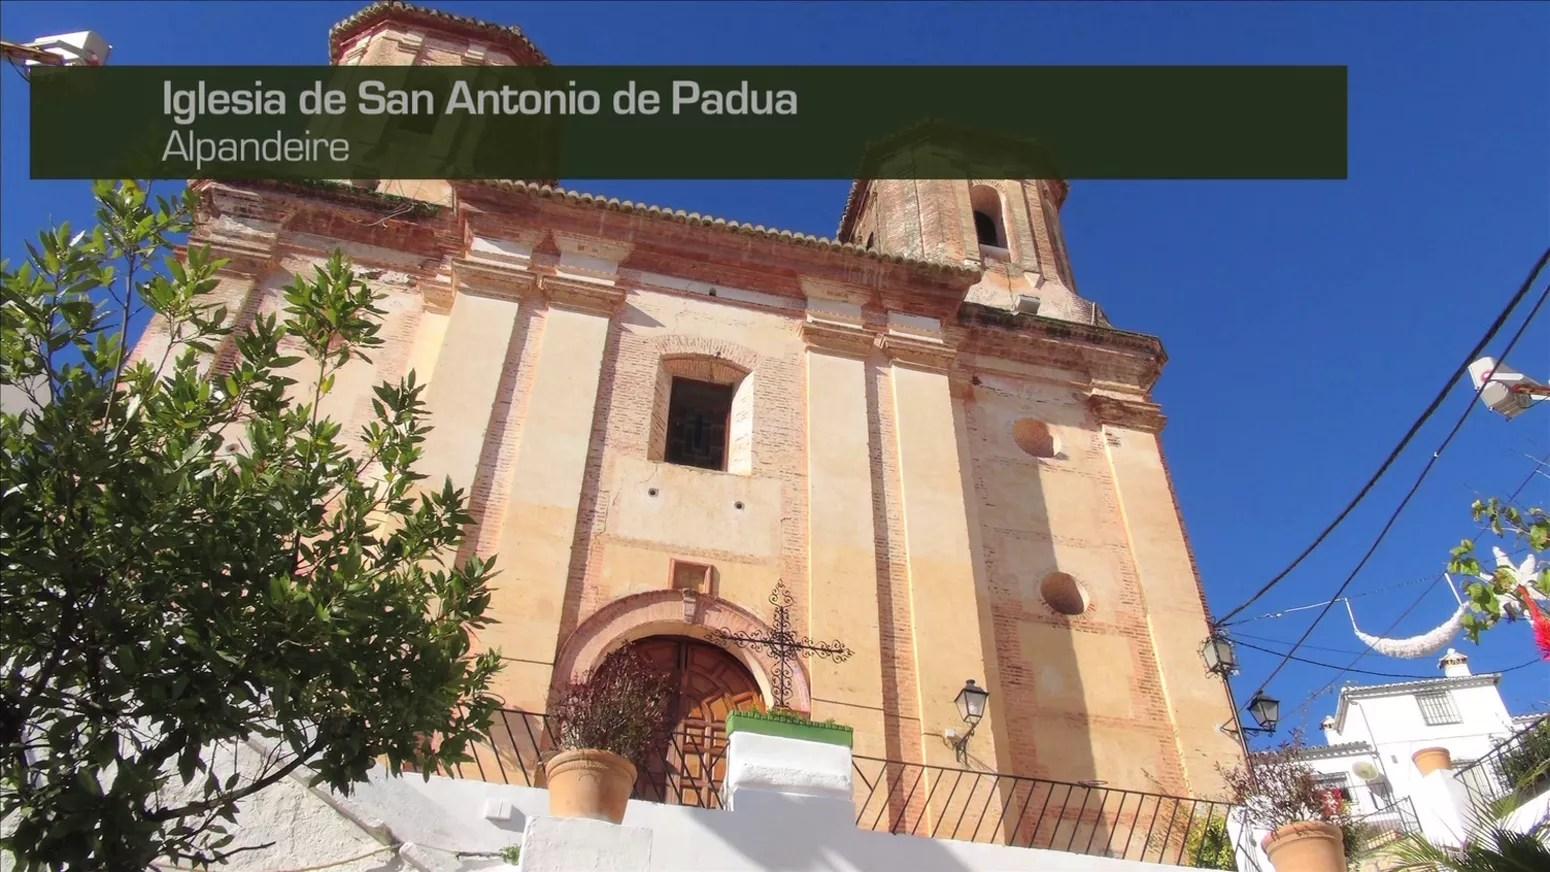 Imagen de Alpandeire. Iglesia San Antonio de Padua1